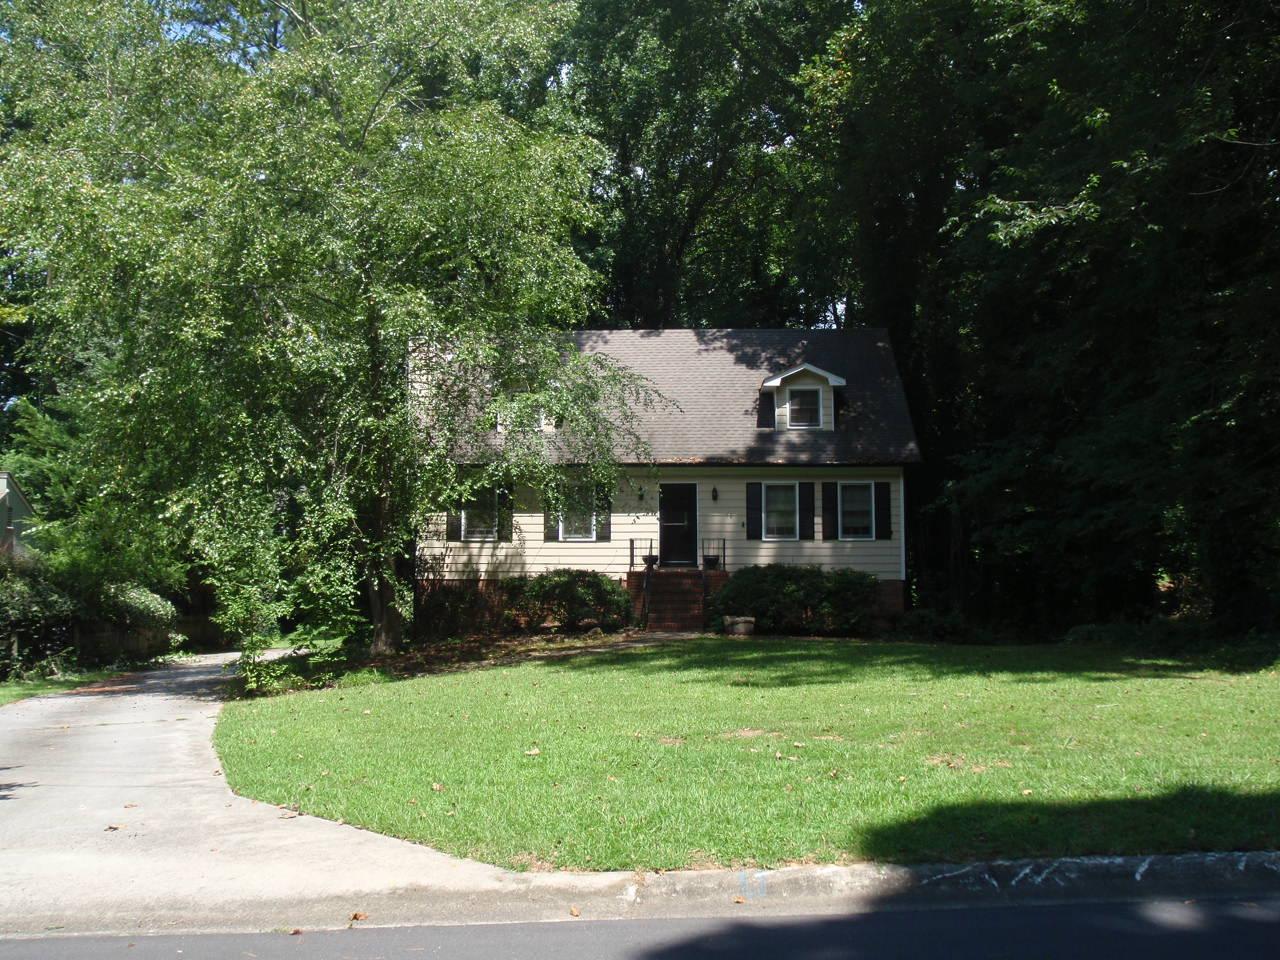 Photo of 2511 Hidden Hills Drive, Marietta, GA, 30066